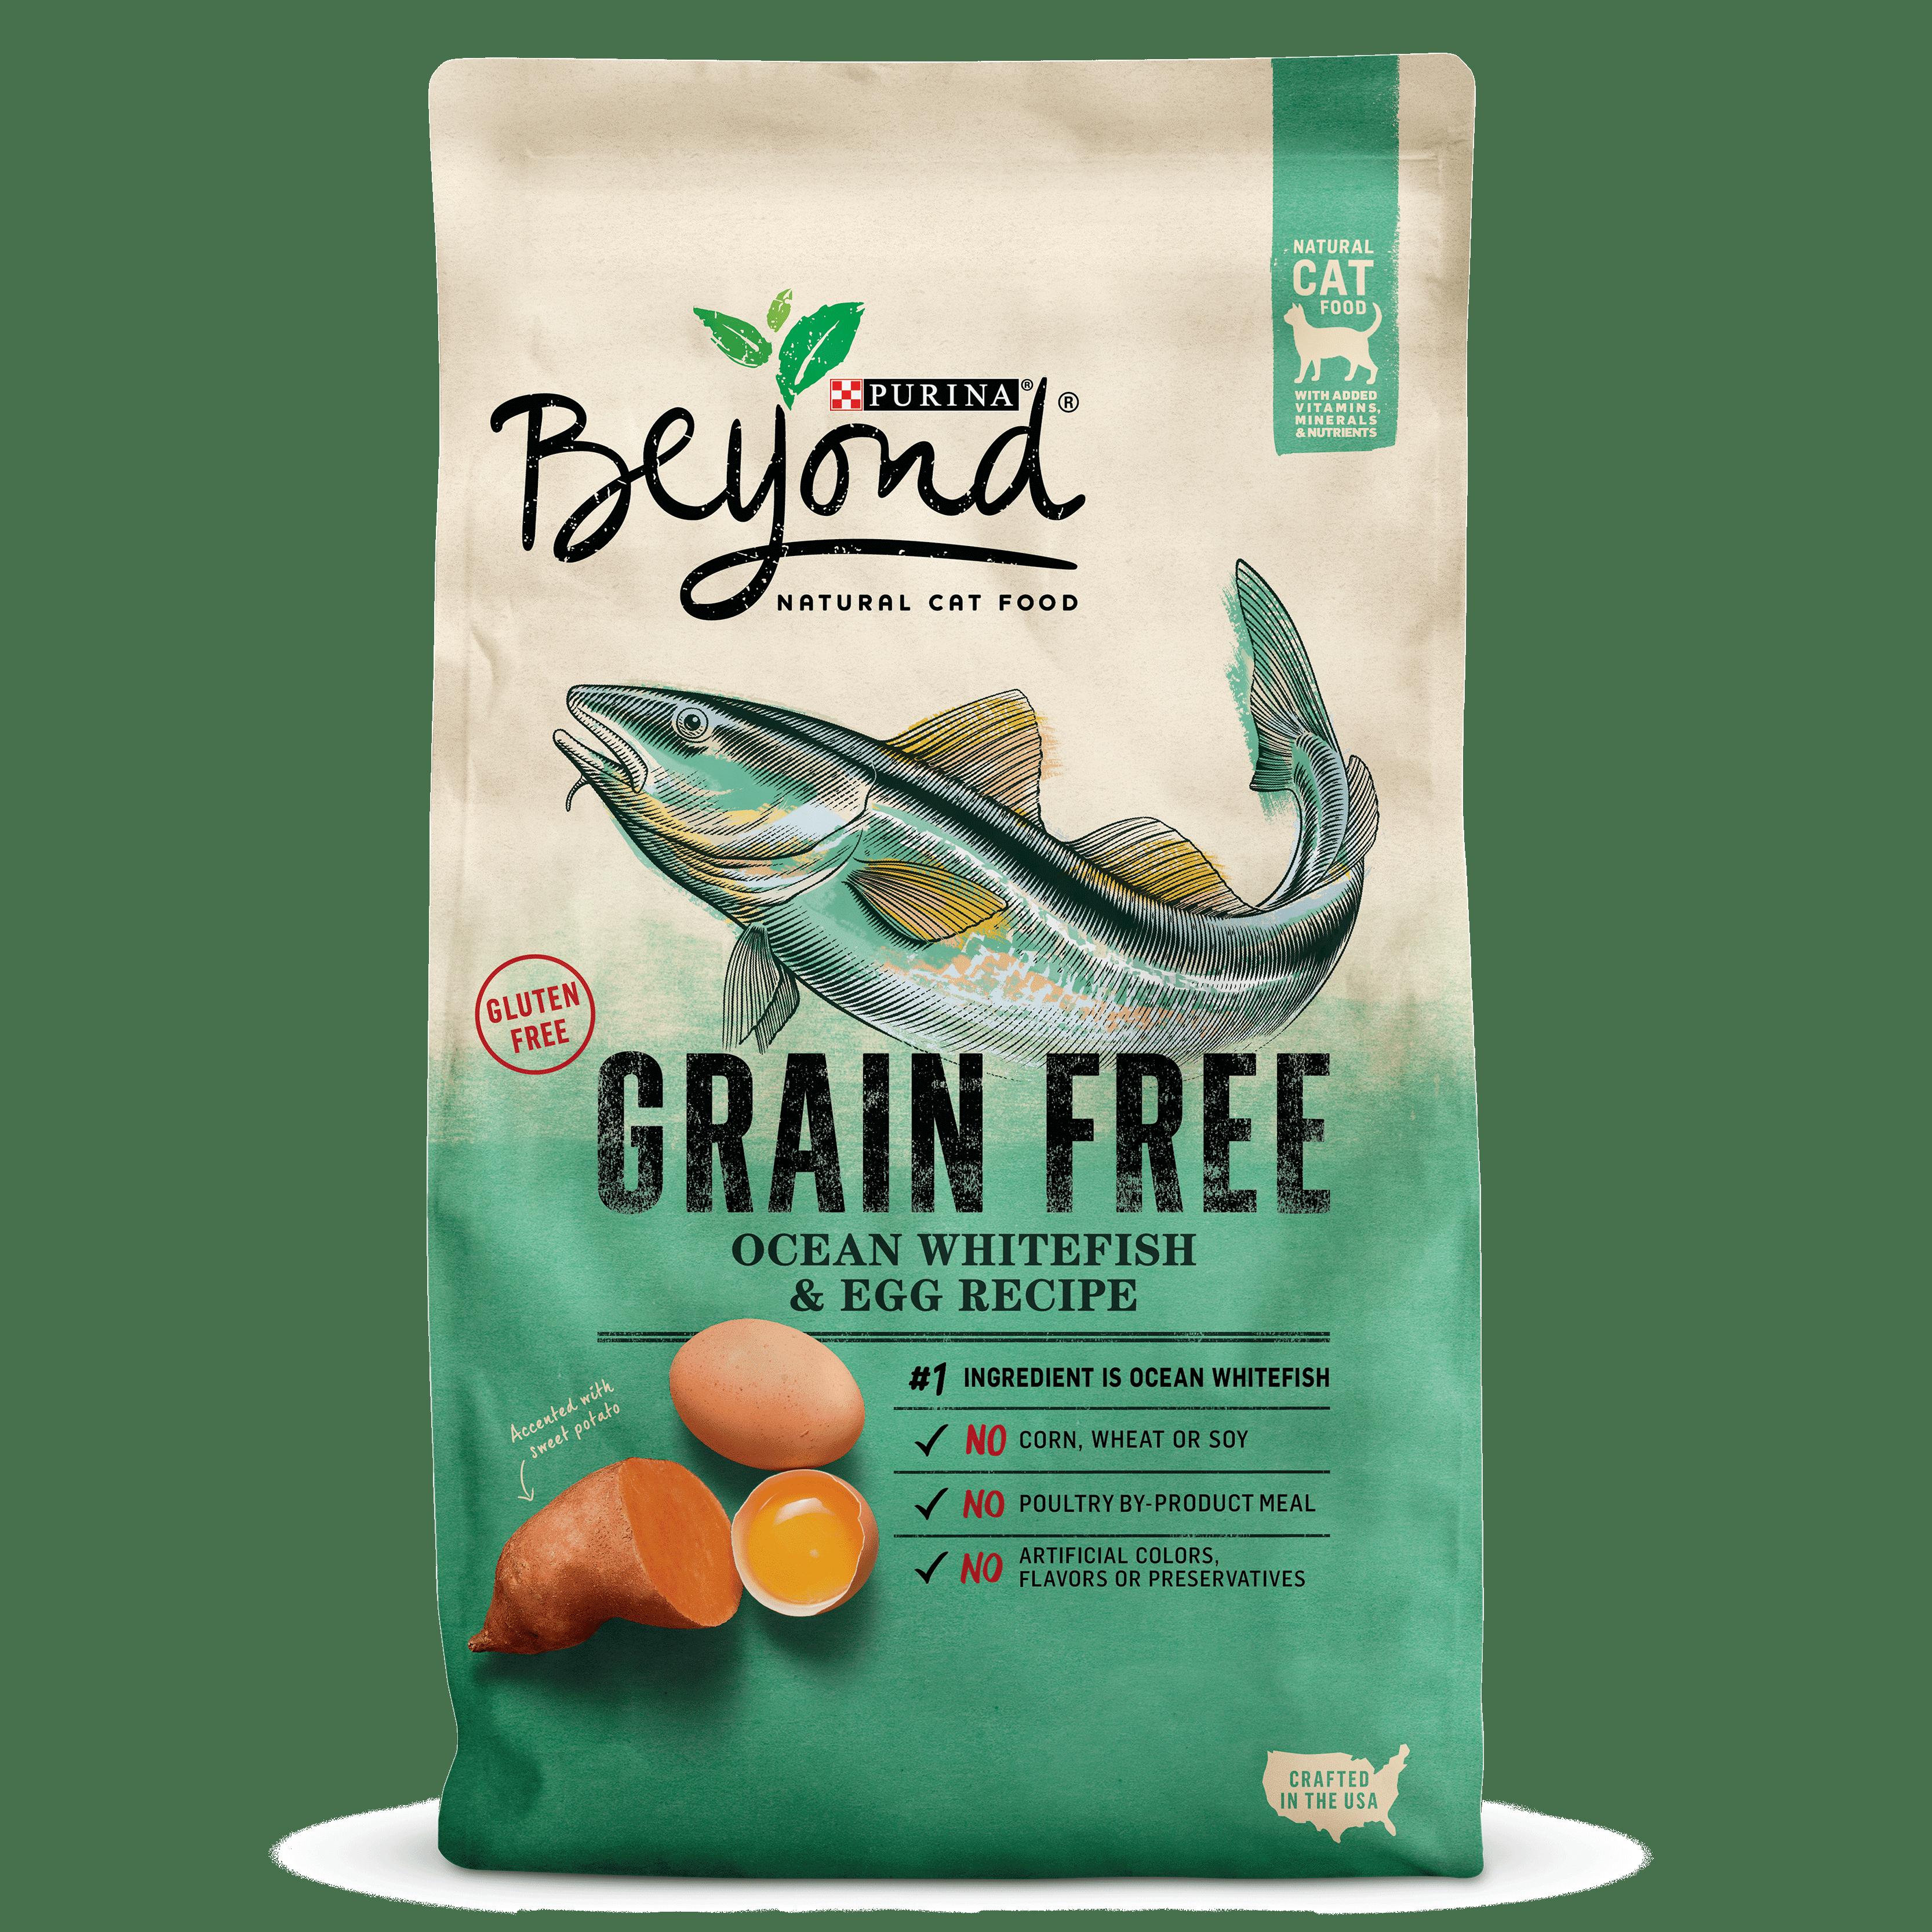 Purina Beyond Grain Free Ocean Whitefish & Egg Recipe Adult Dry Cat Food, 5 Lb